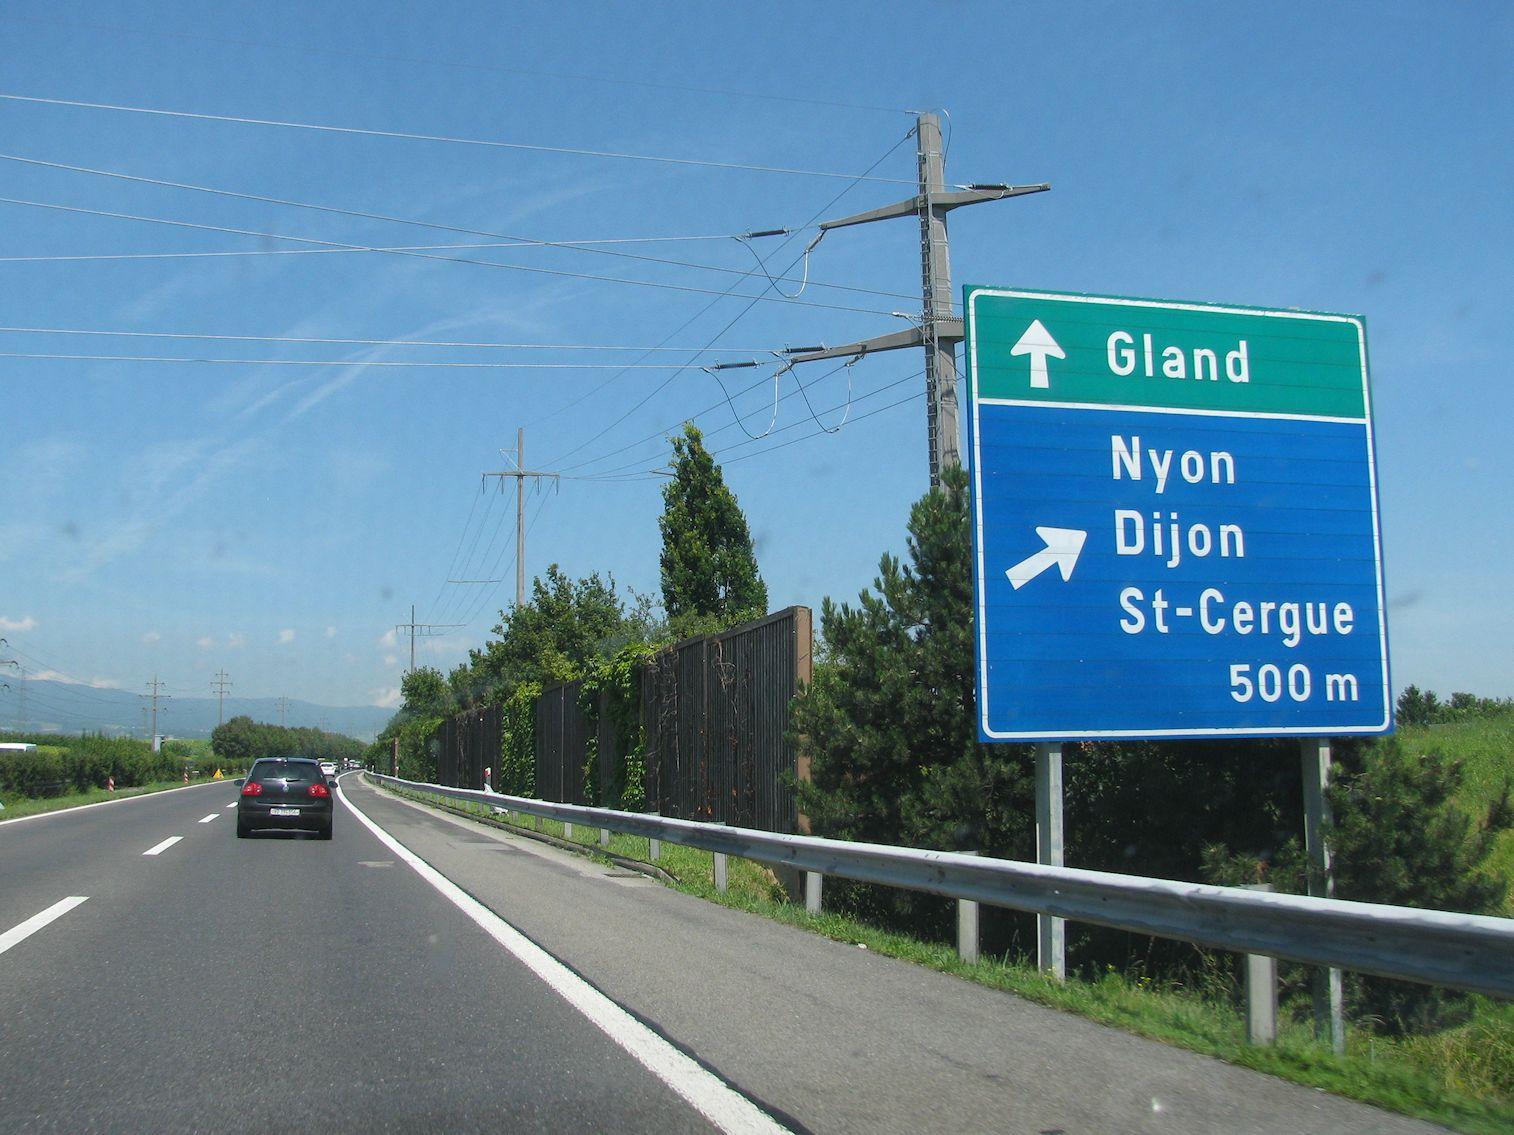 drive dijon elegant dijon drive va with drive dijon excellent drive dijon with drive dijon. Black Bedroom Furniture Sets. Home Design Ideas